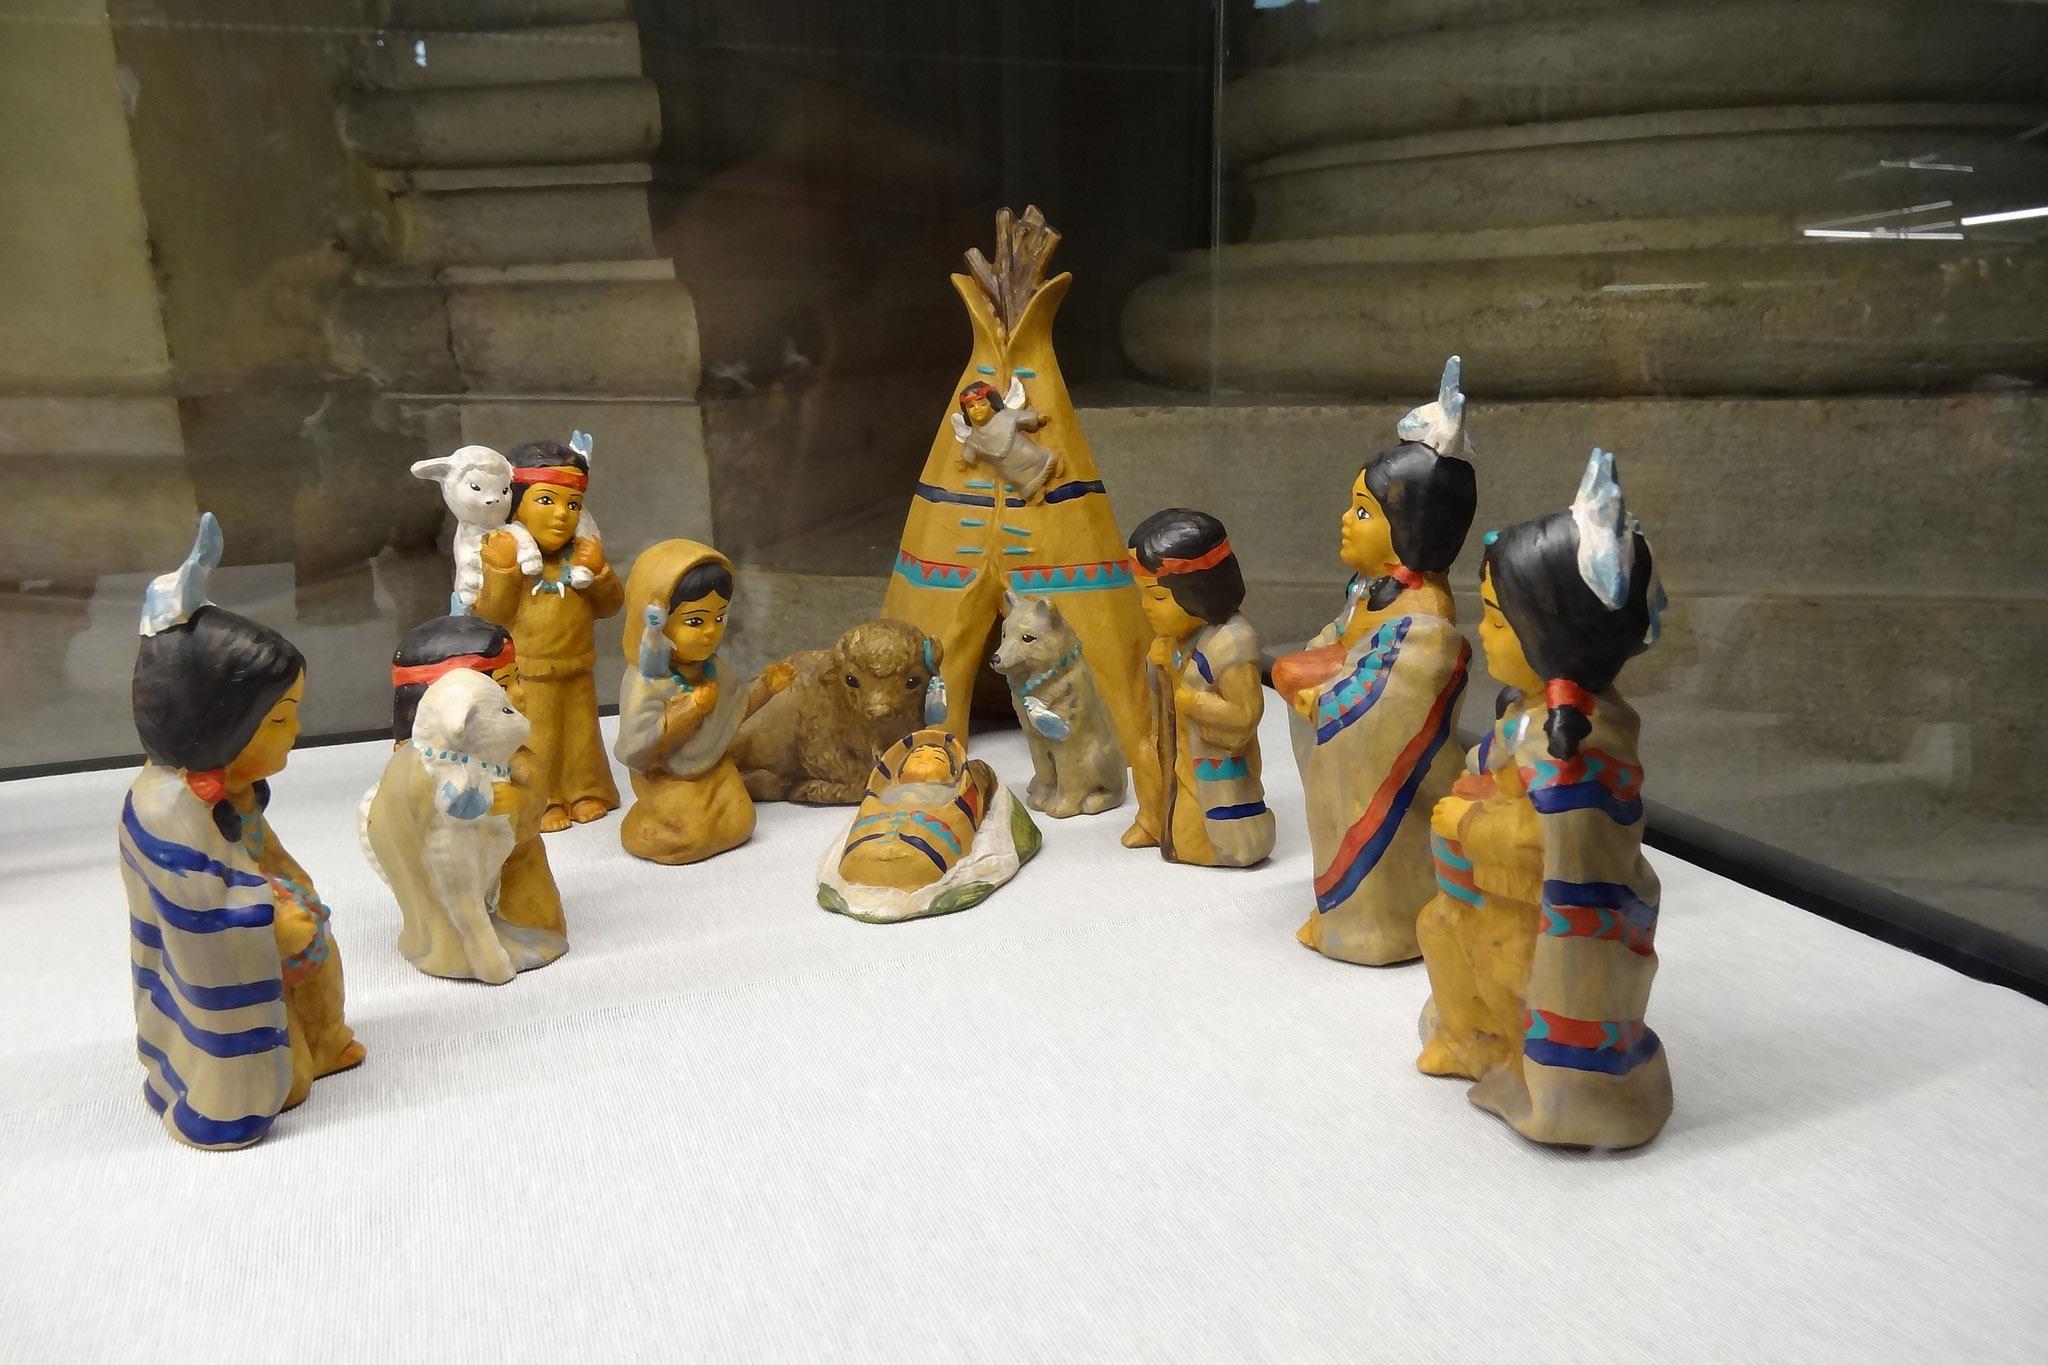 web-nativity-manger-christmascanada-john-donaghy-cc